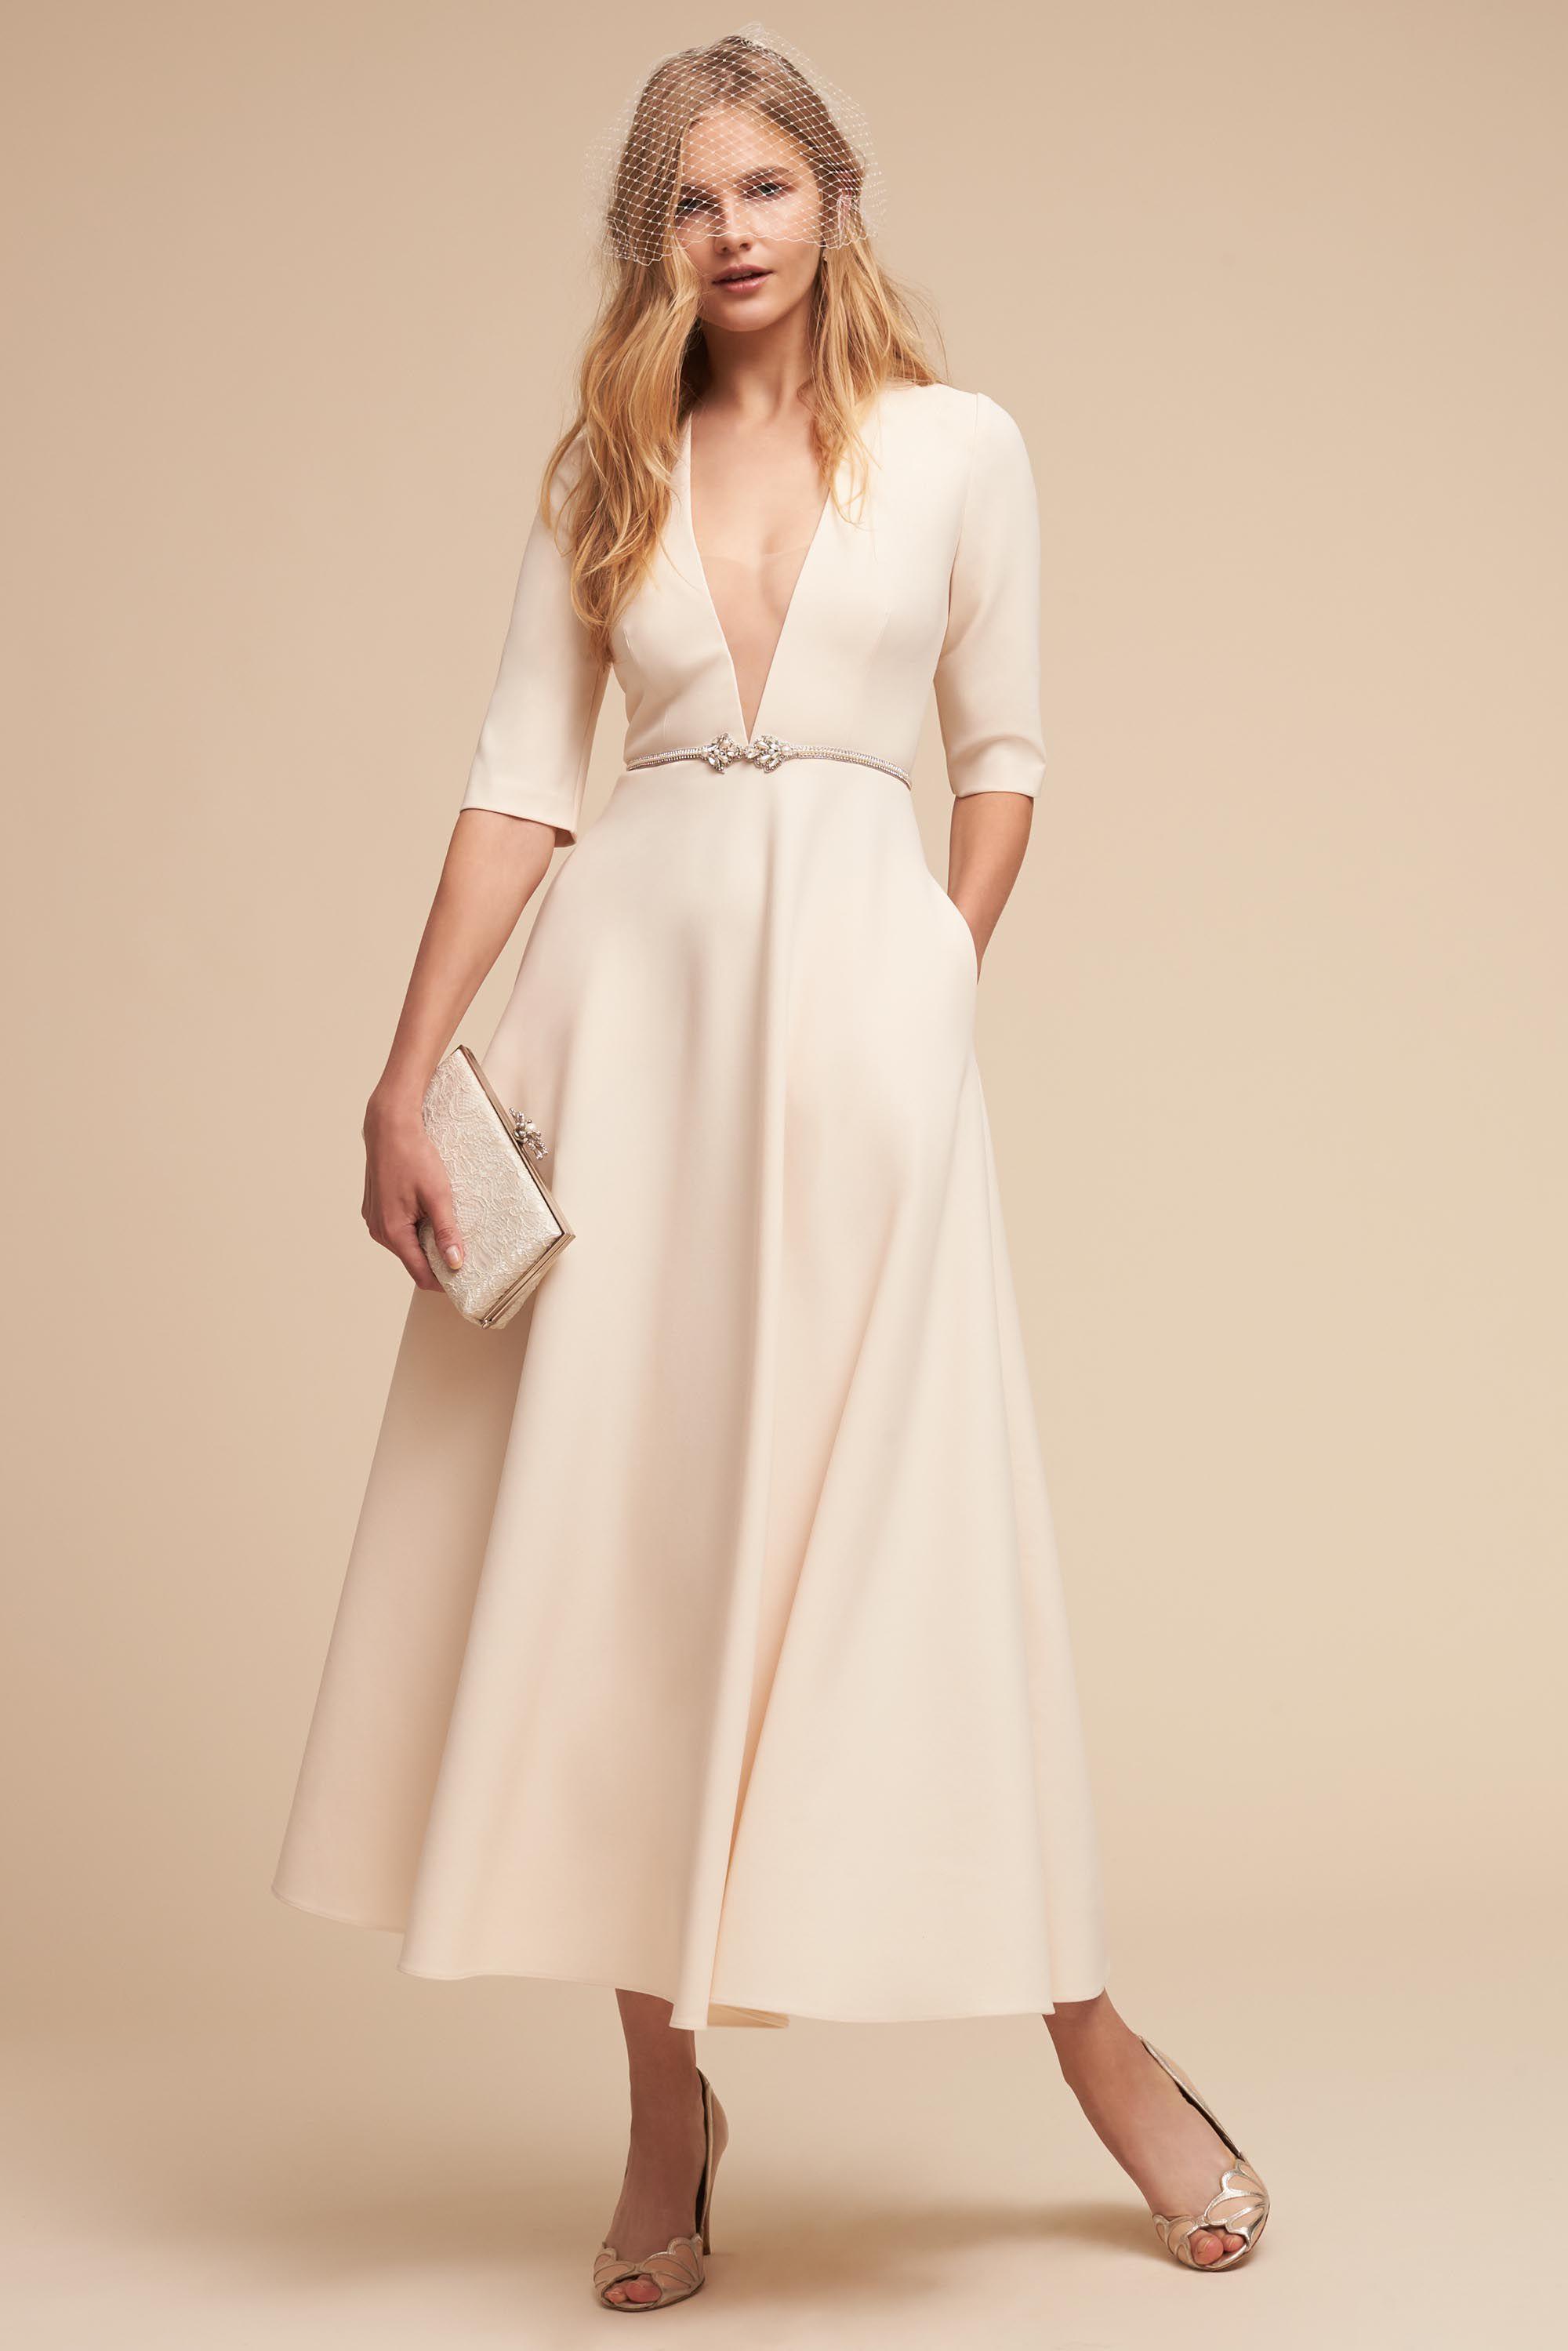 Tea length sleeve wedding dress  Kennedy Gown from BHLDN  Lucille u Ericus Love Board  Pinterest